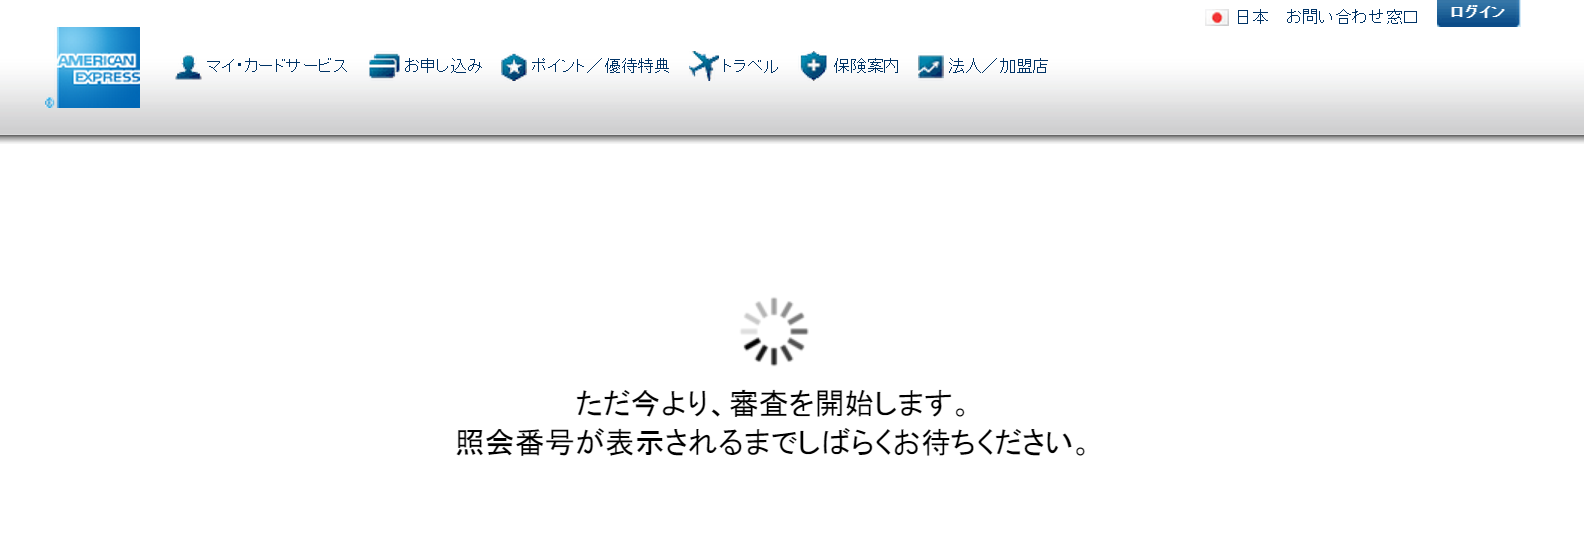 SPGアメックス自動審査